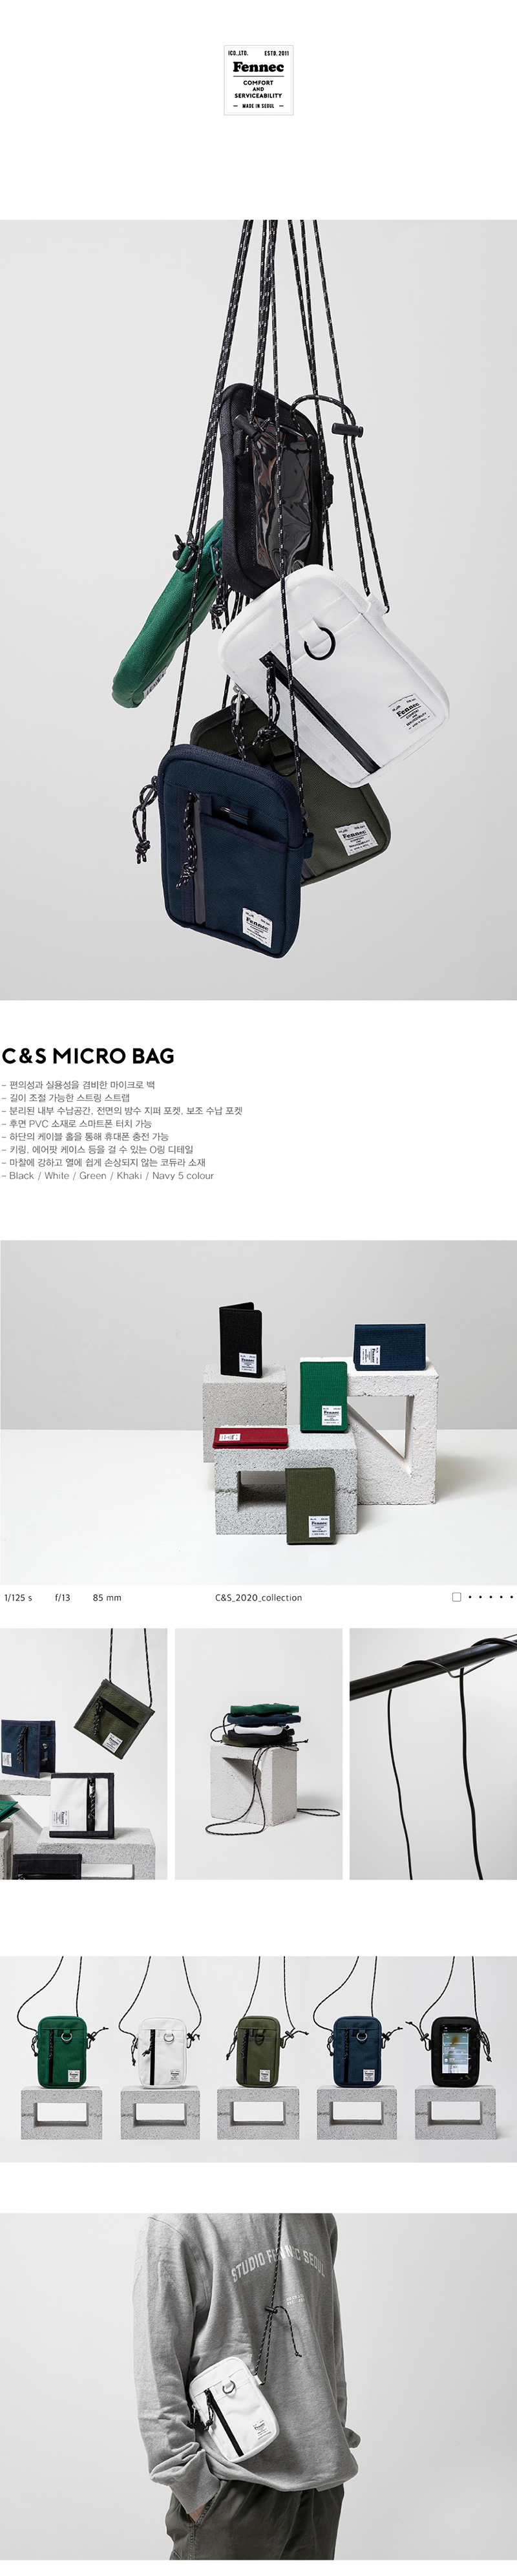 10x10-C_S-micro-bag-wh_01.jpg